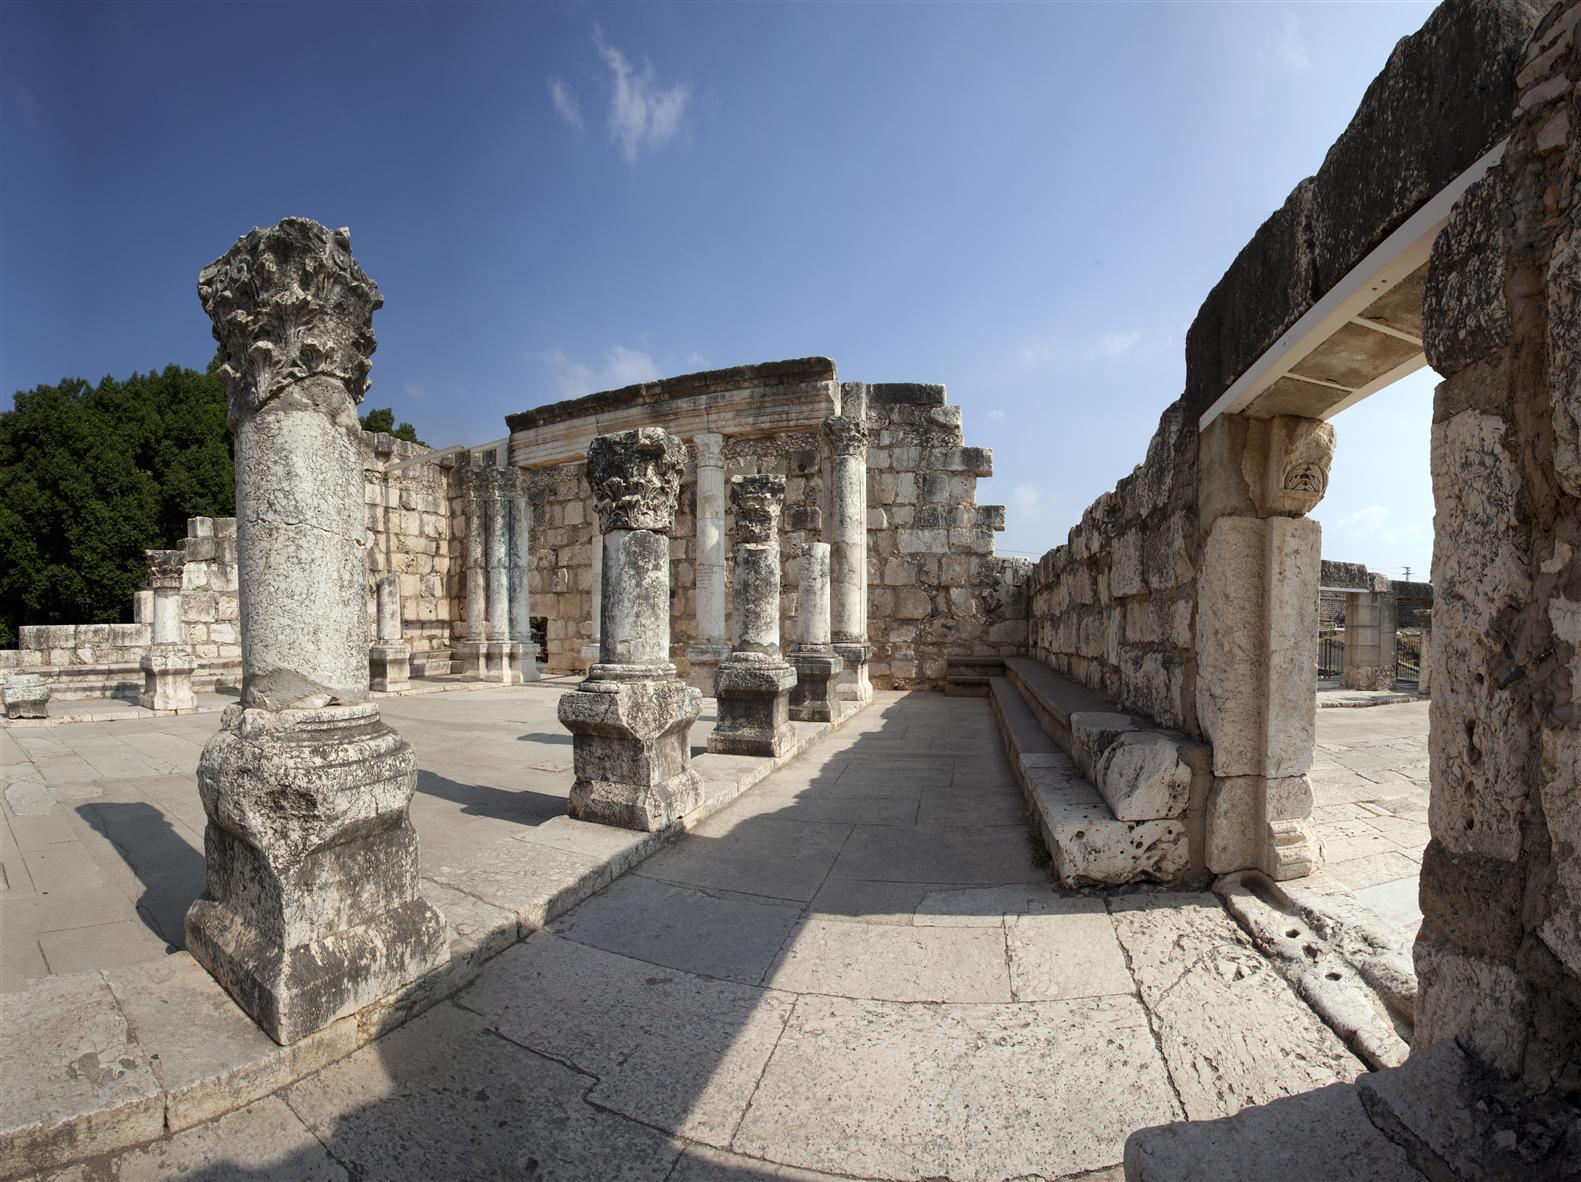 capernaum-2-synagogue.jpg